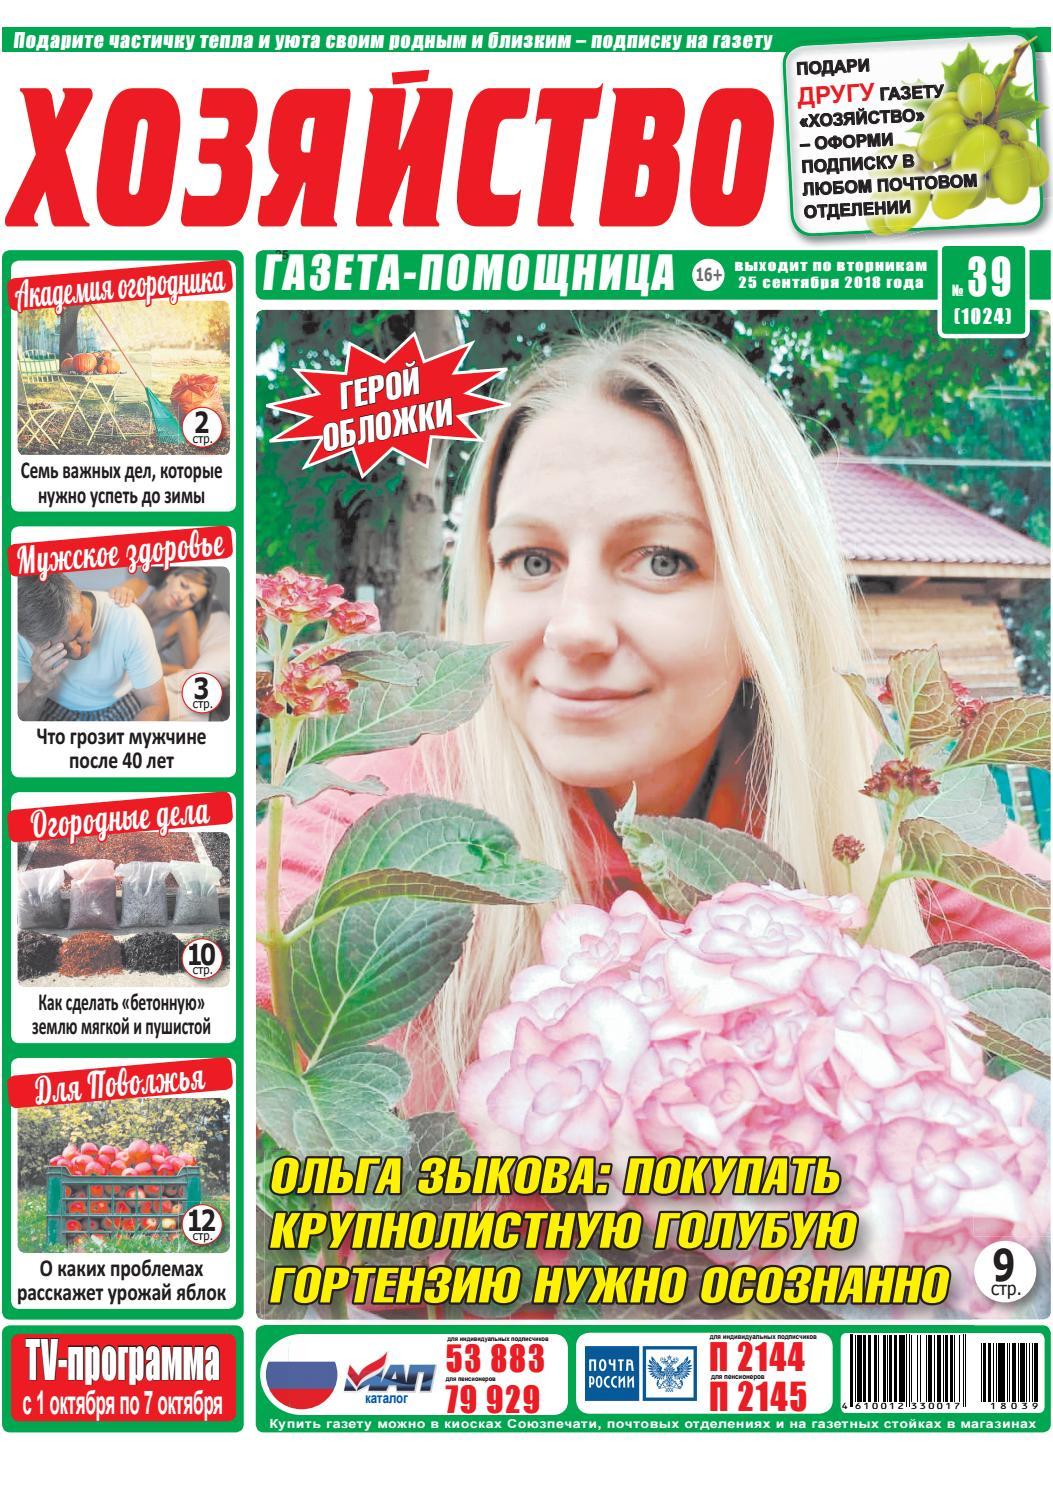 Ольга Бузова Светит Сосками На Шоу «План Б»